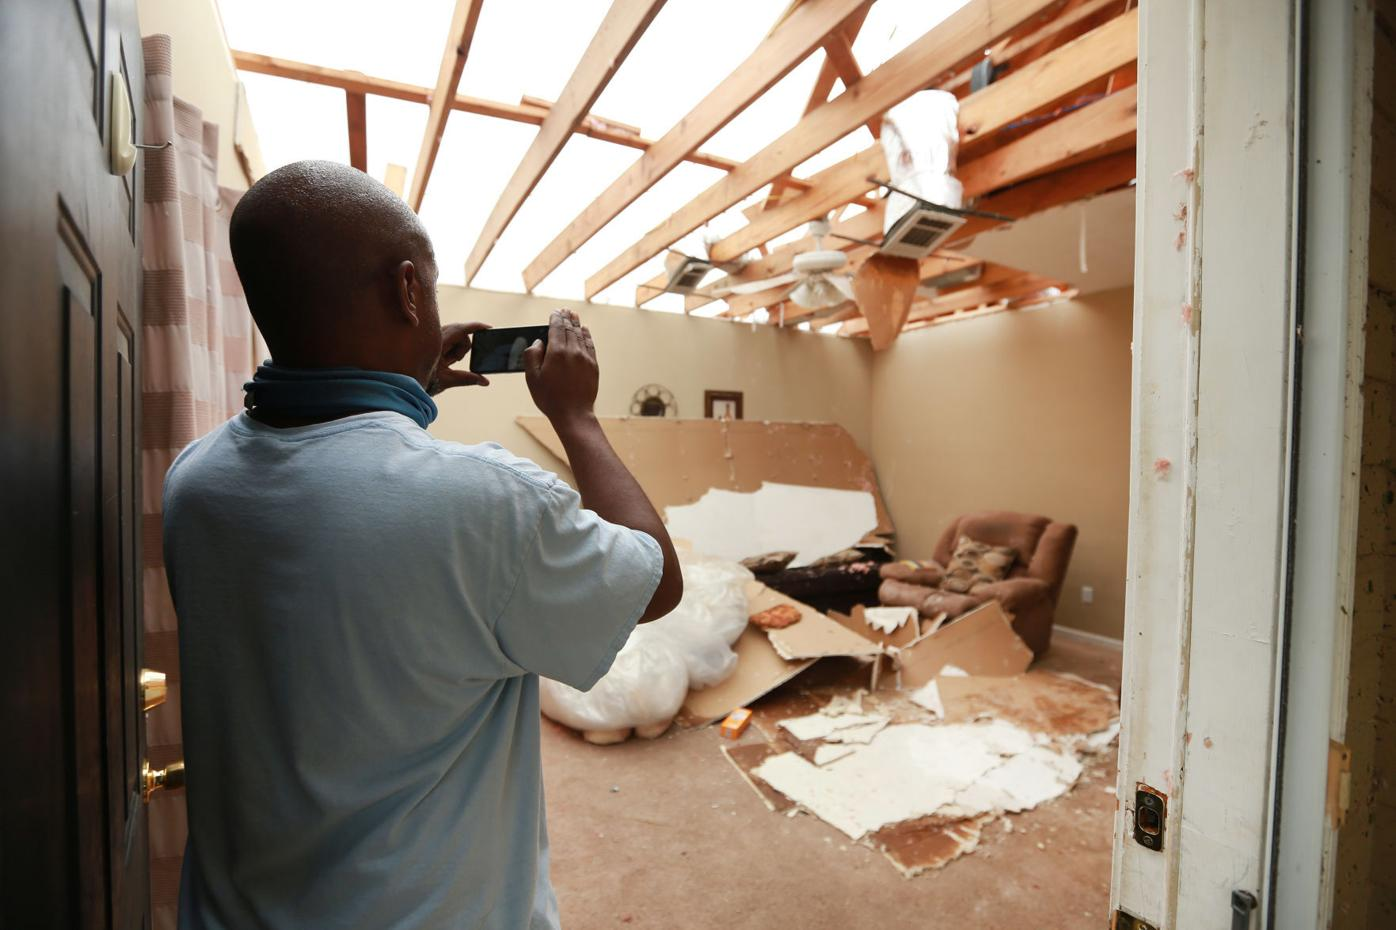 djr-2021-05-04-news-tupelo-tornado-arp2